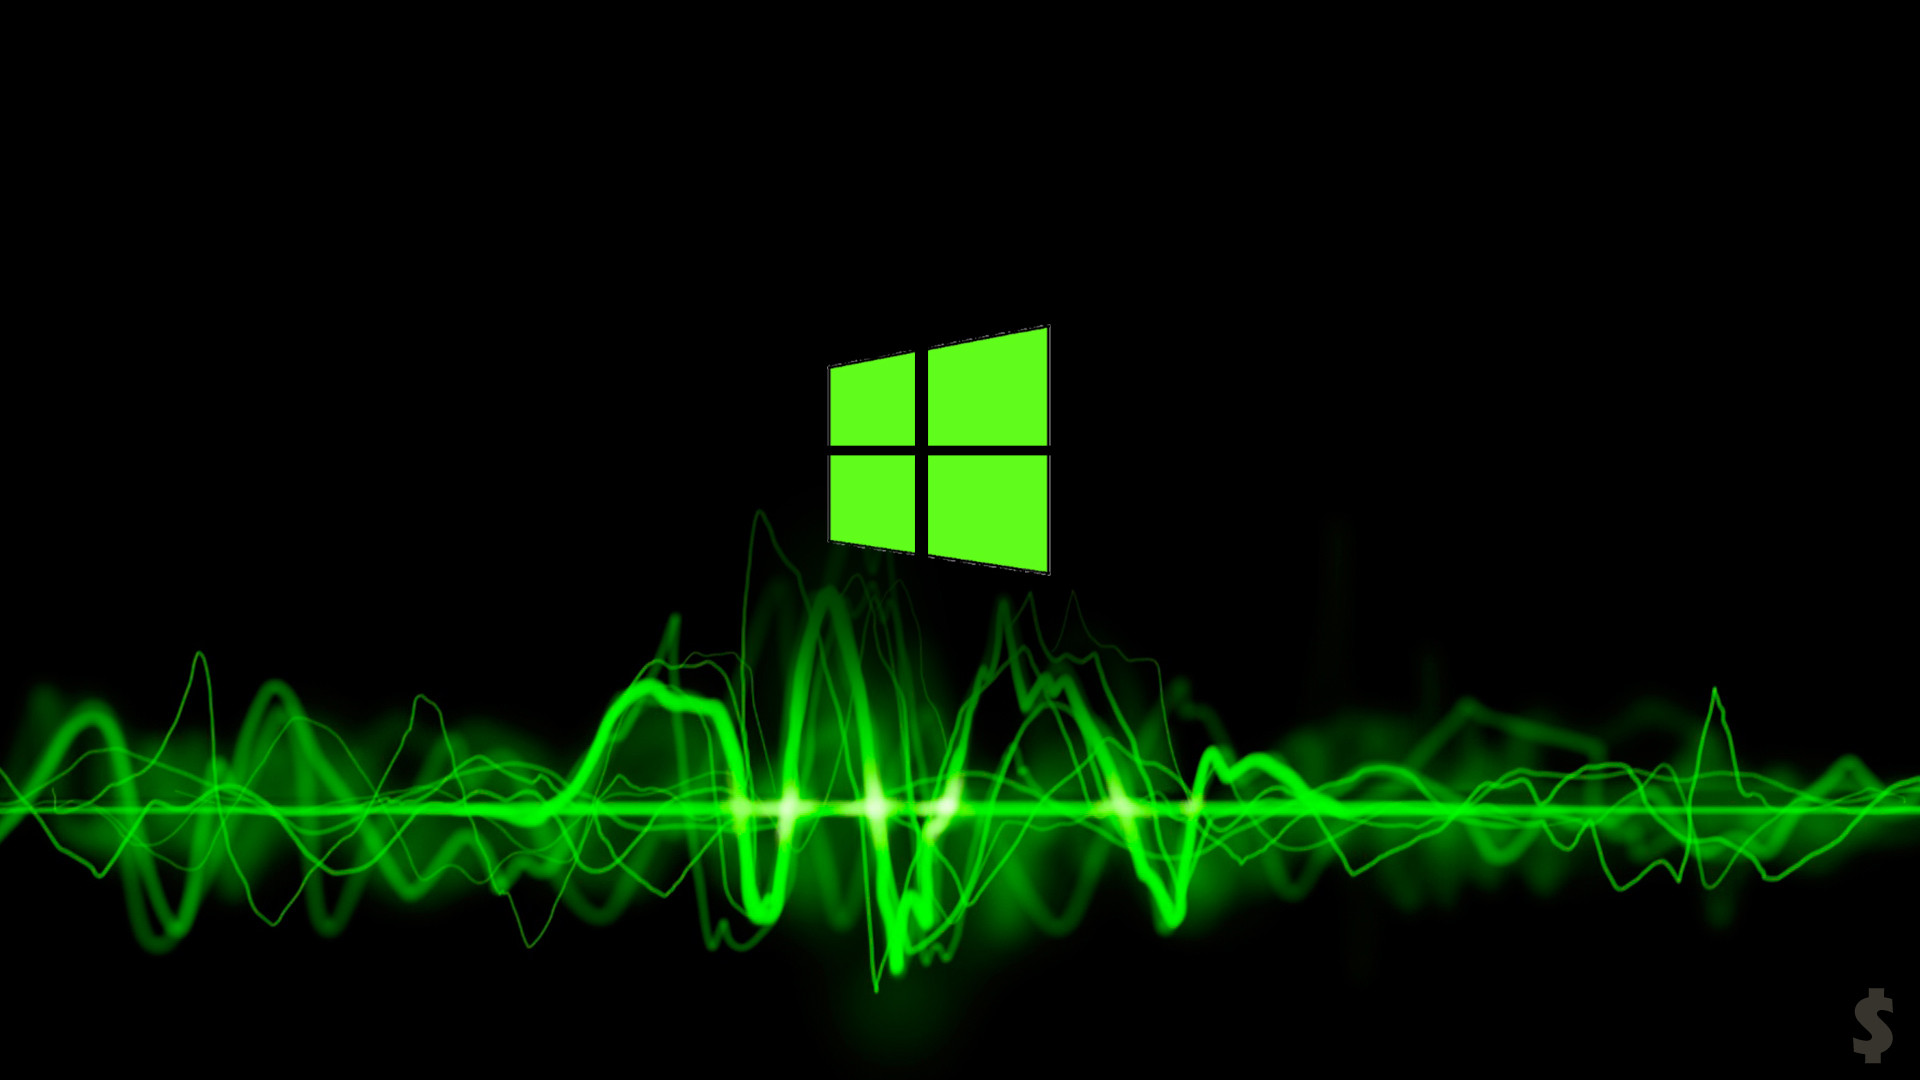 Windows 10 Green Wallpaper (71+ images)